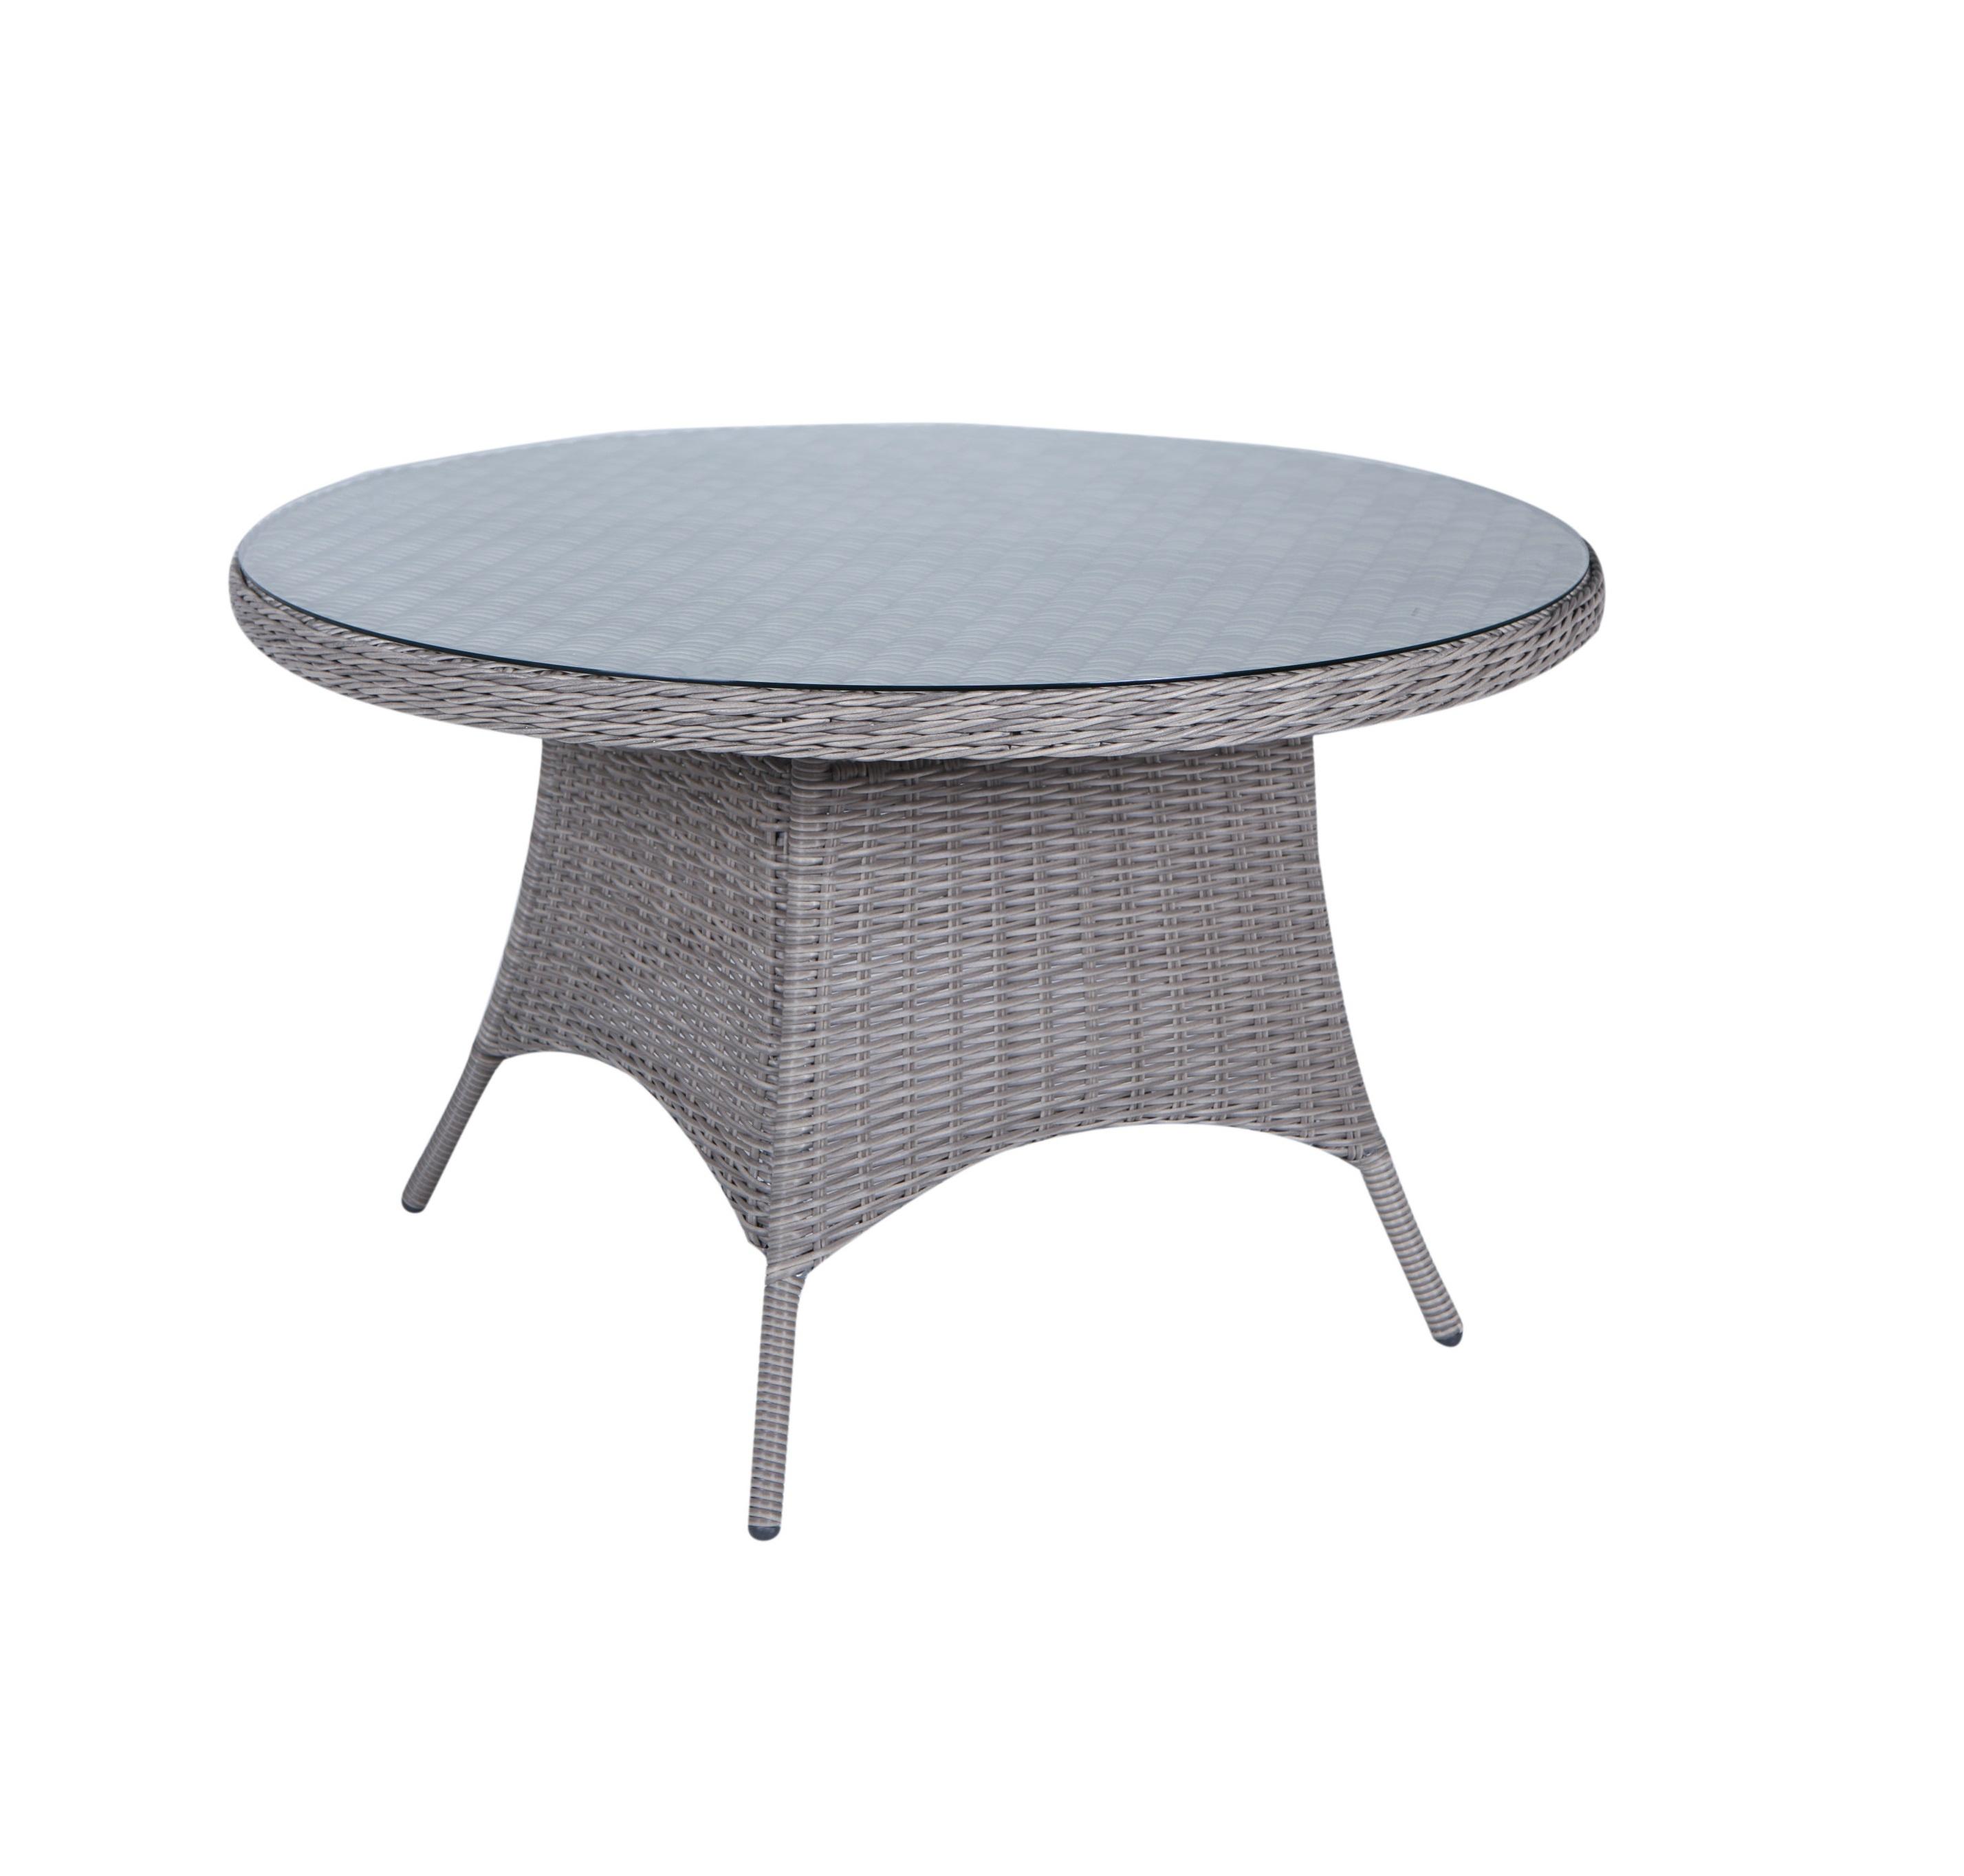 patio furniture aluniumum rattan round glass top outdoor dinning table buy patio alunimun table round dinning table rattan glass table product on alibaba com